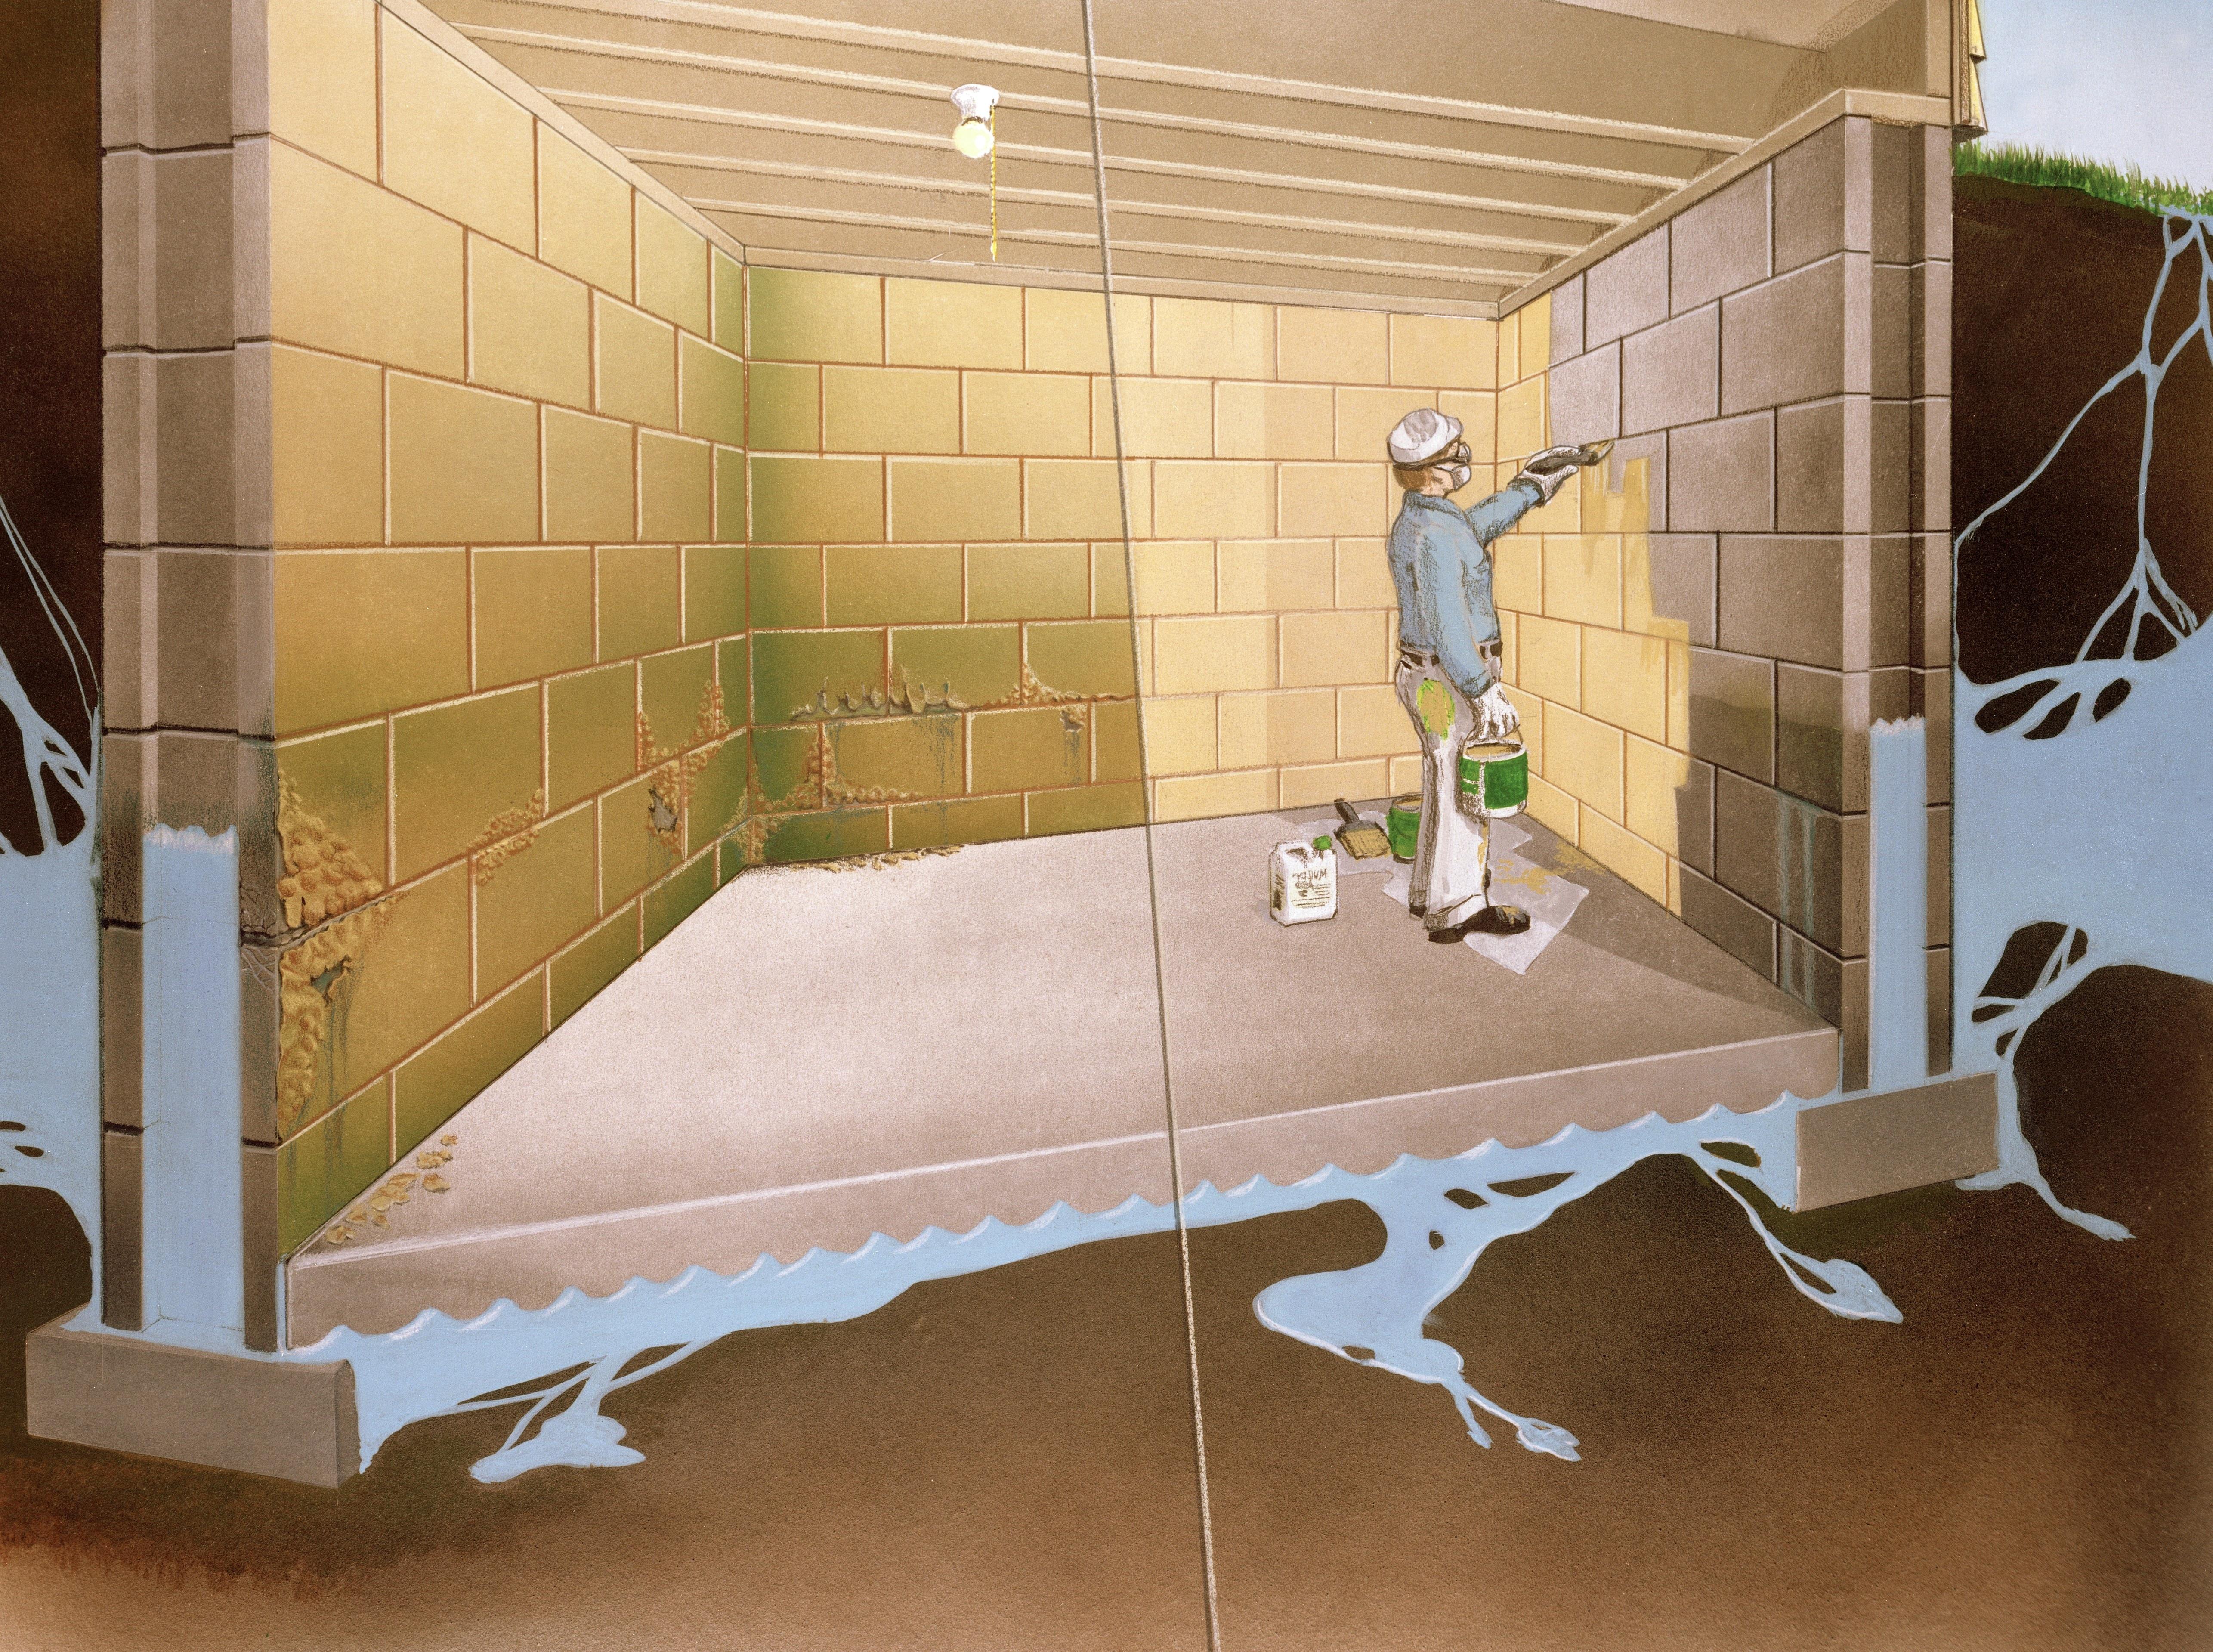 B Dry Basement Waterproofing Complaints